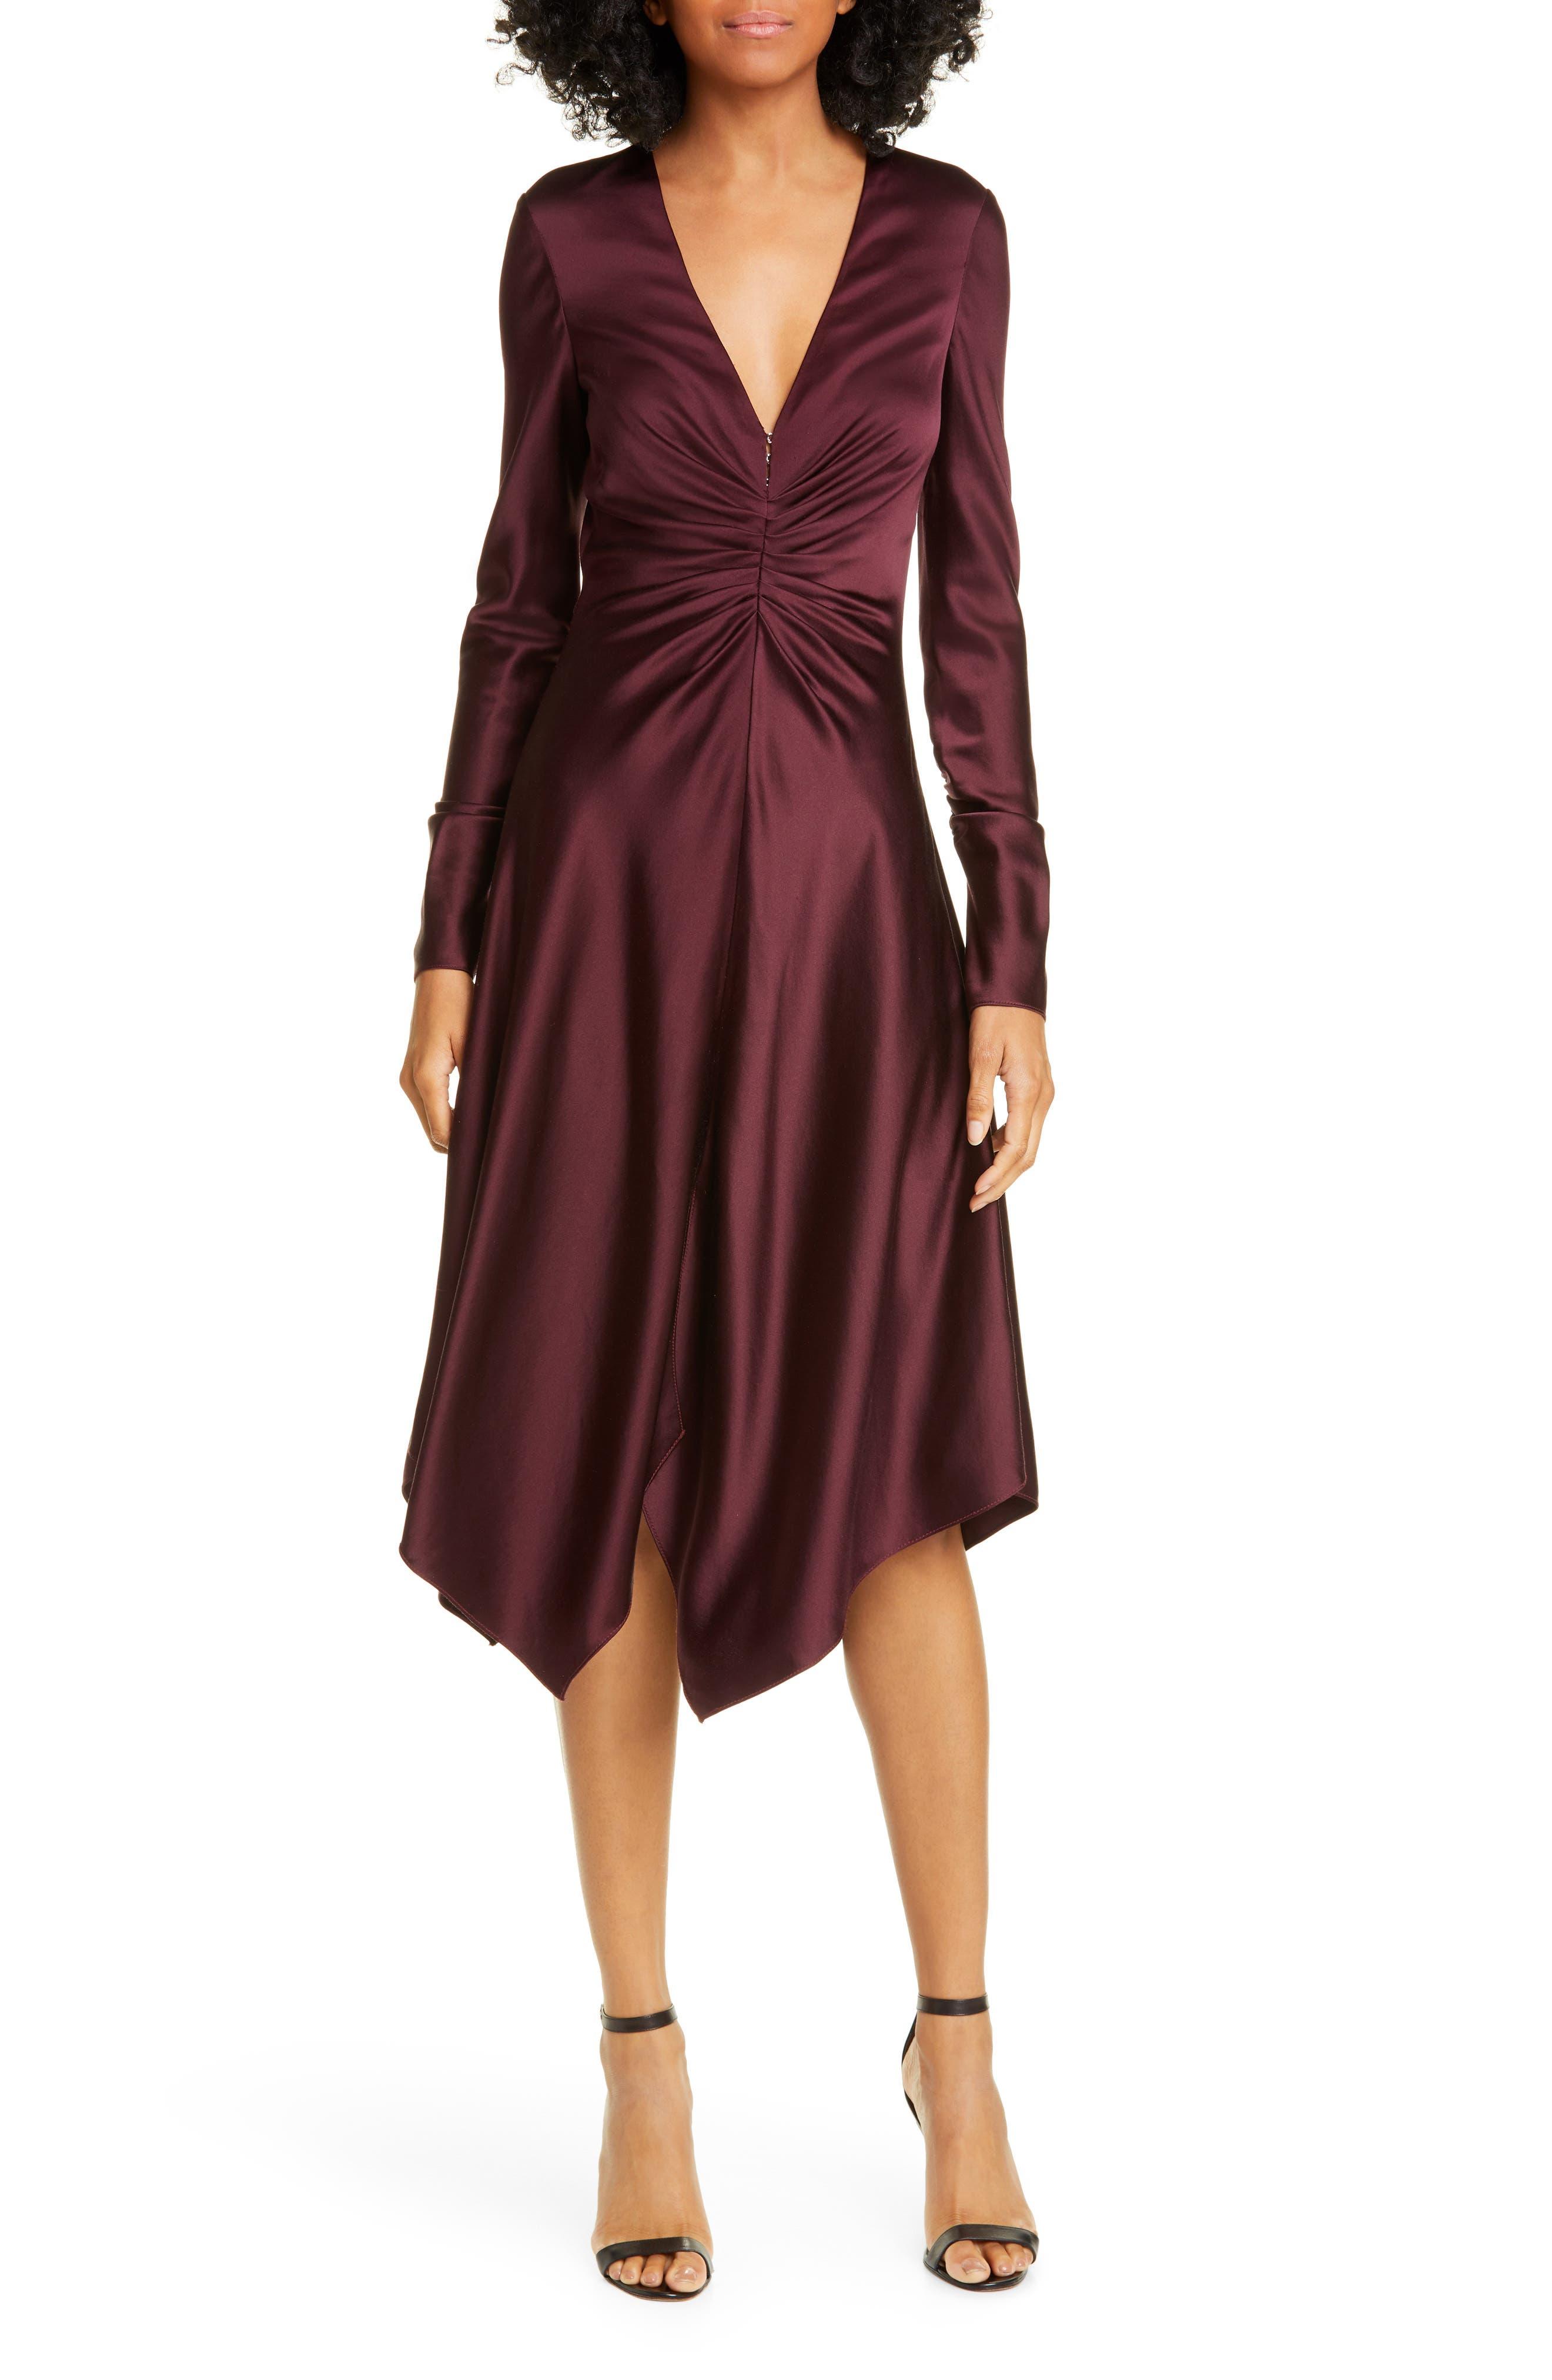 Jonathan Simkhai Dresses Crepe Back Satin Long Sleeve Handkerchief Dress